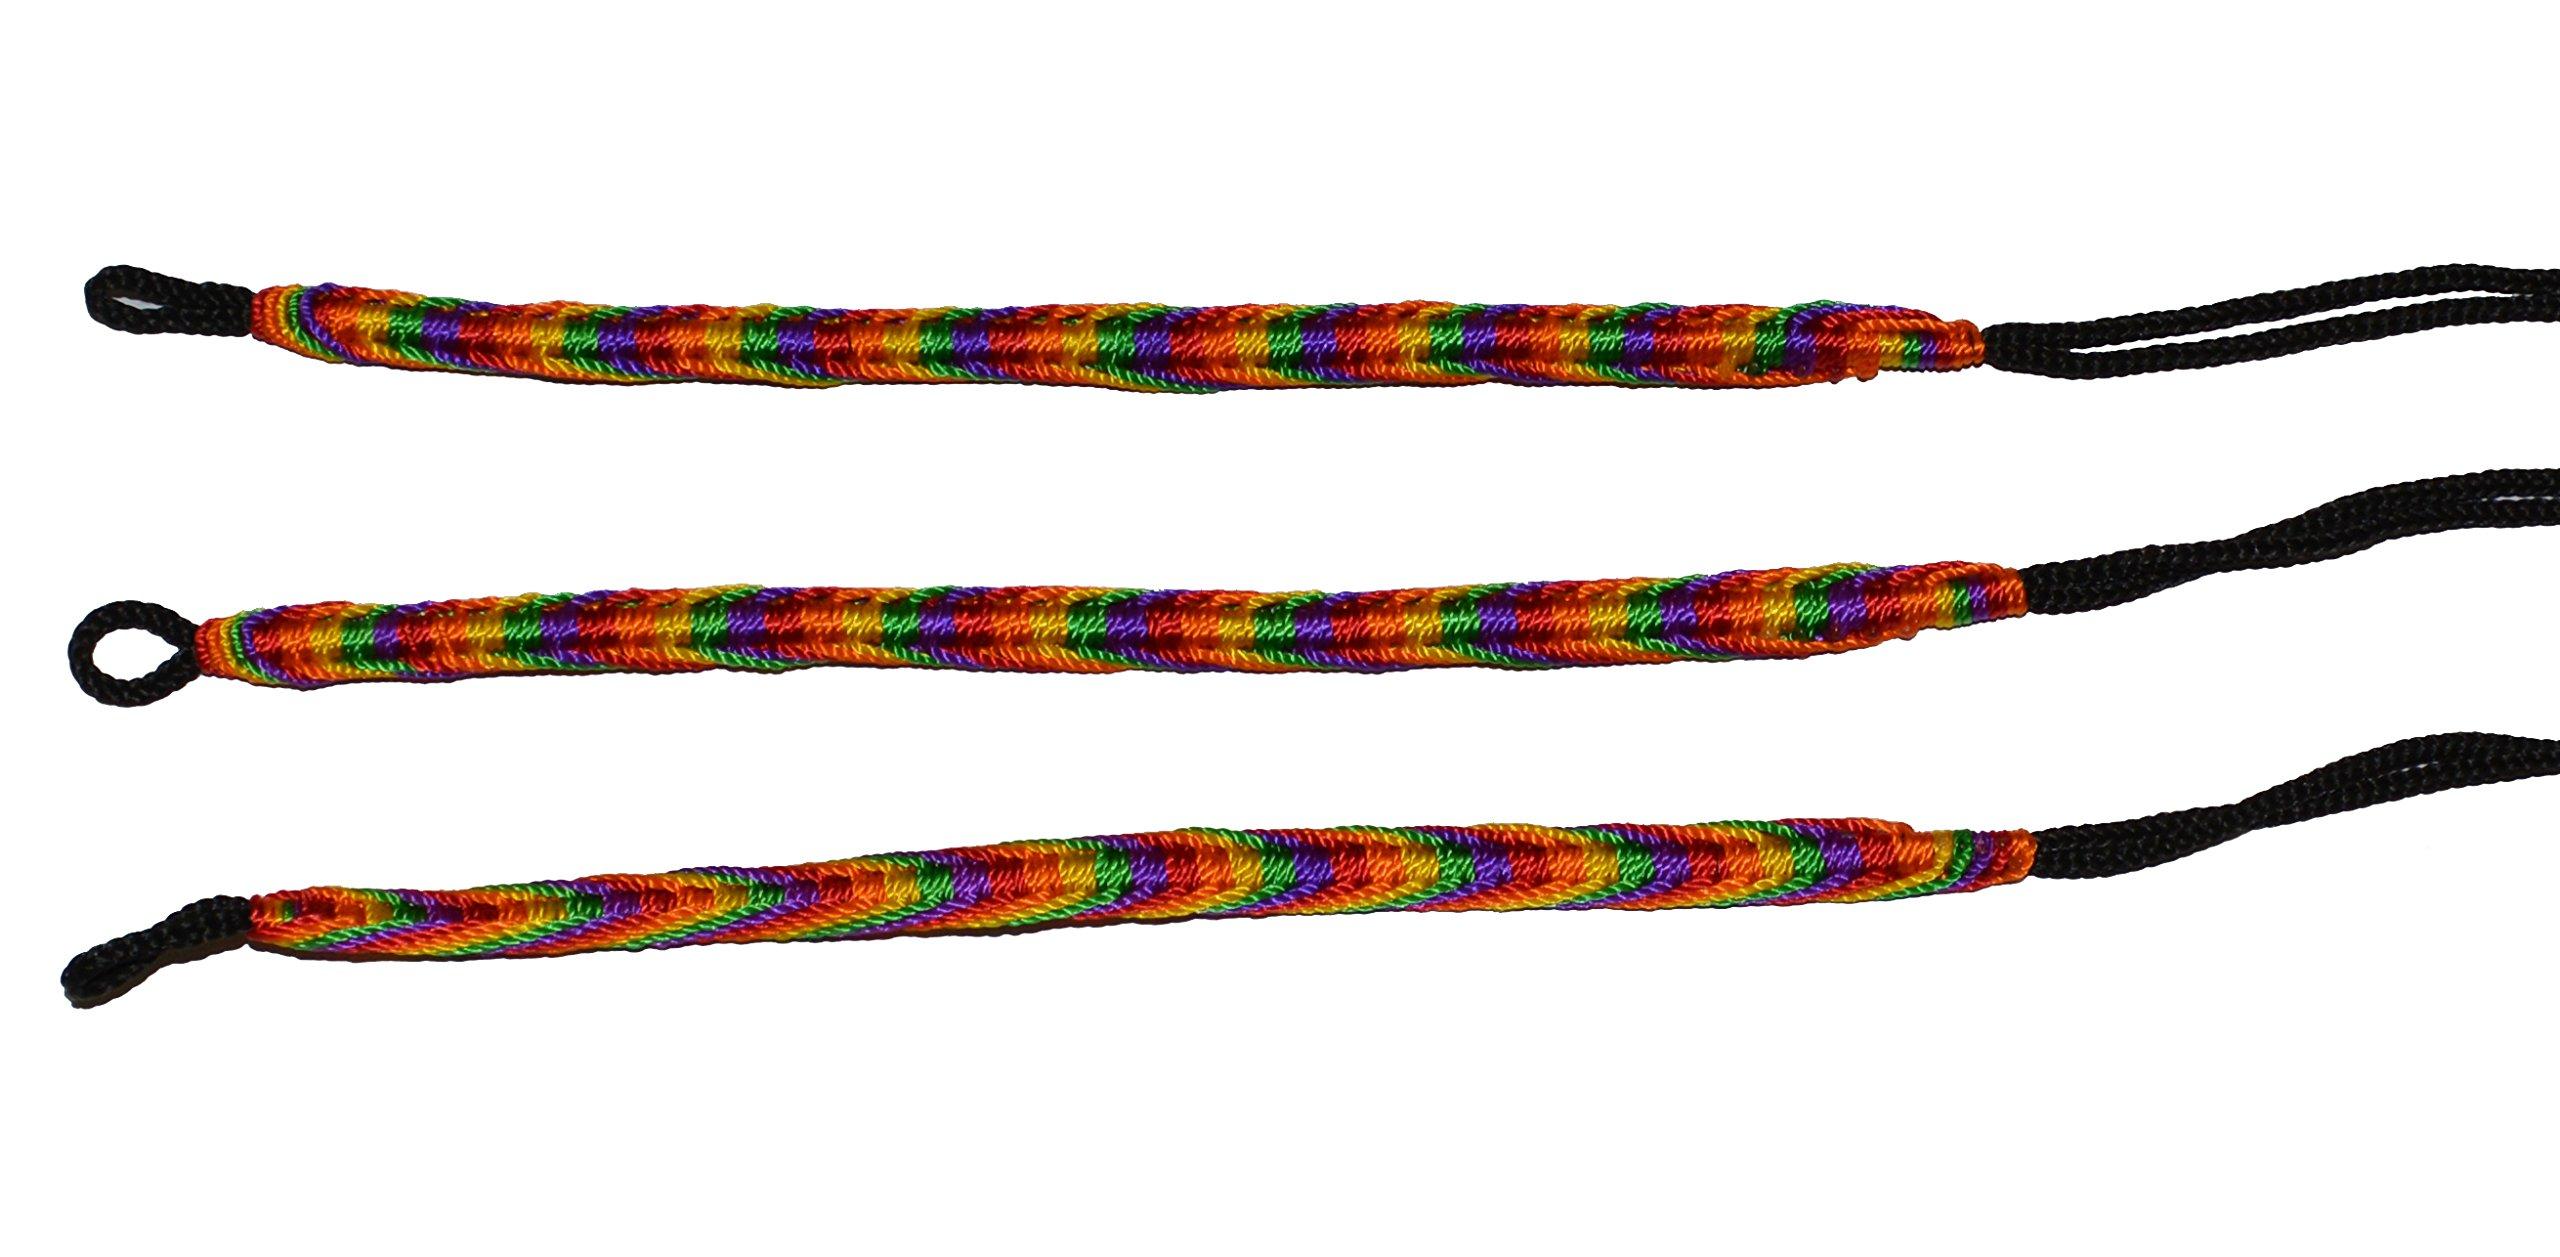 Rainbow Friendship Bracelets LOT 100 MIX From Peru Wholesale GAY Lesbian Pride by Handmade In Peru (Image #3)